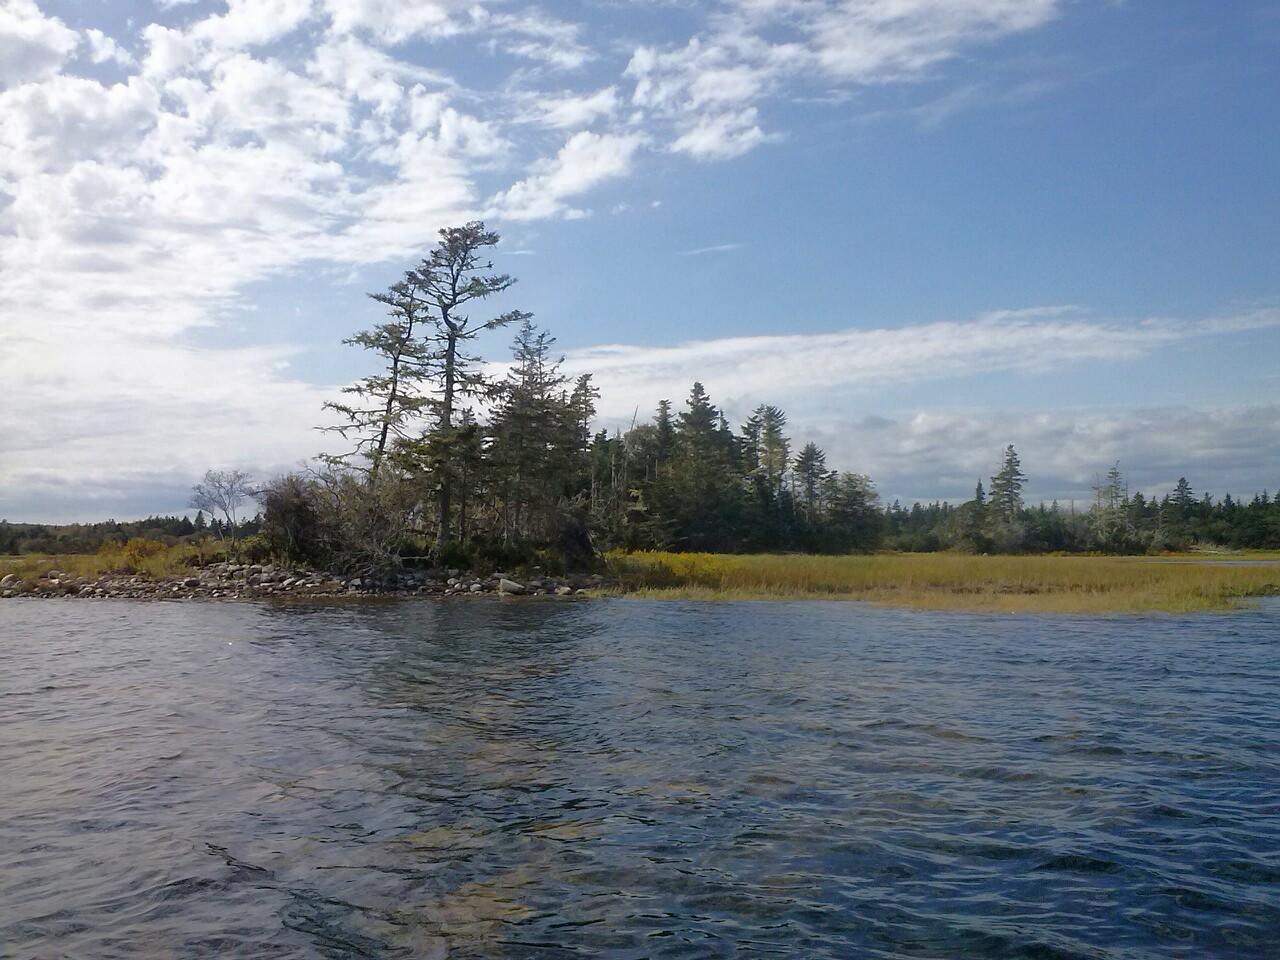 Sunny Seas Nature Park Island